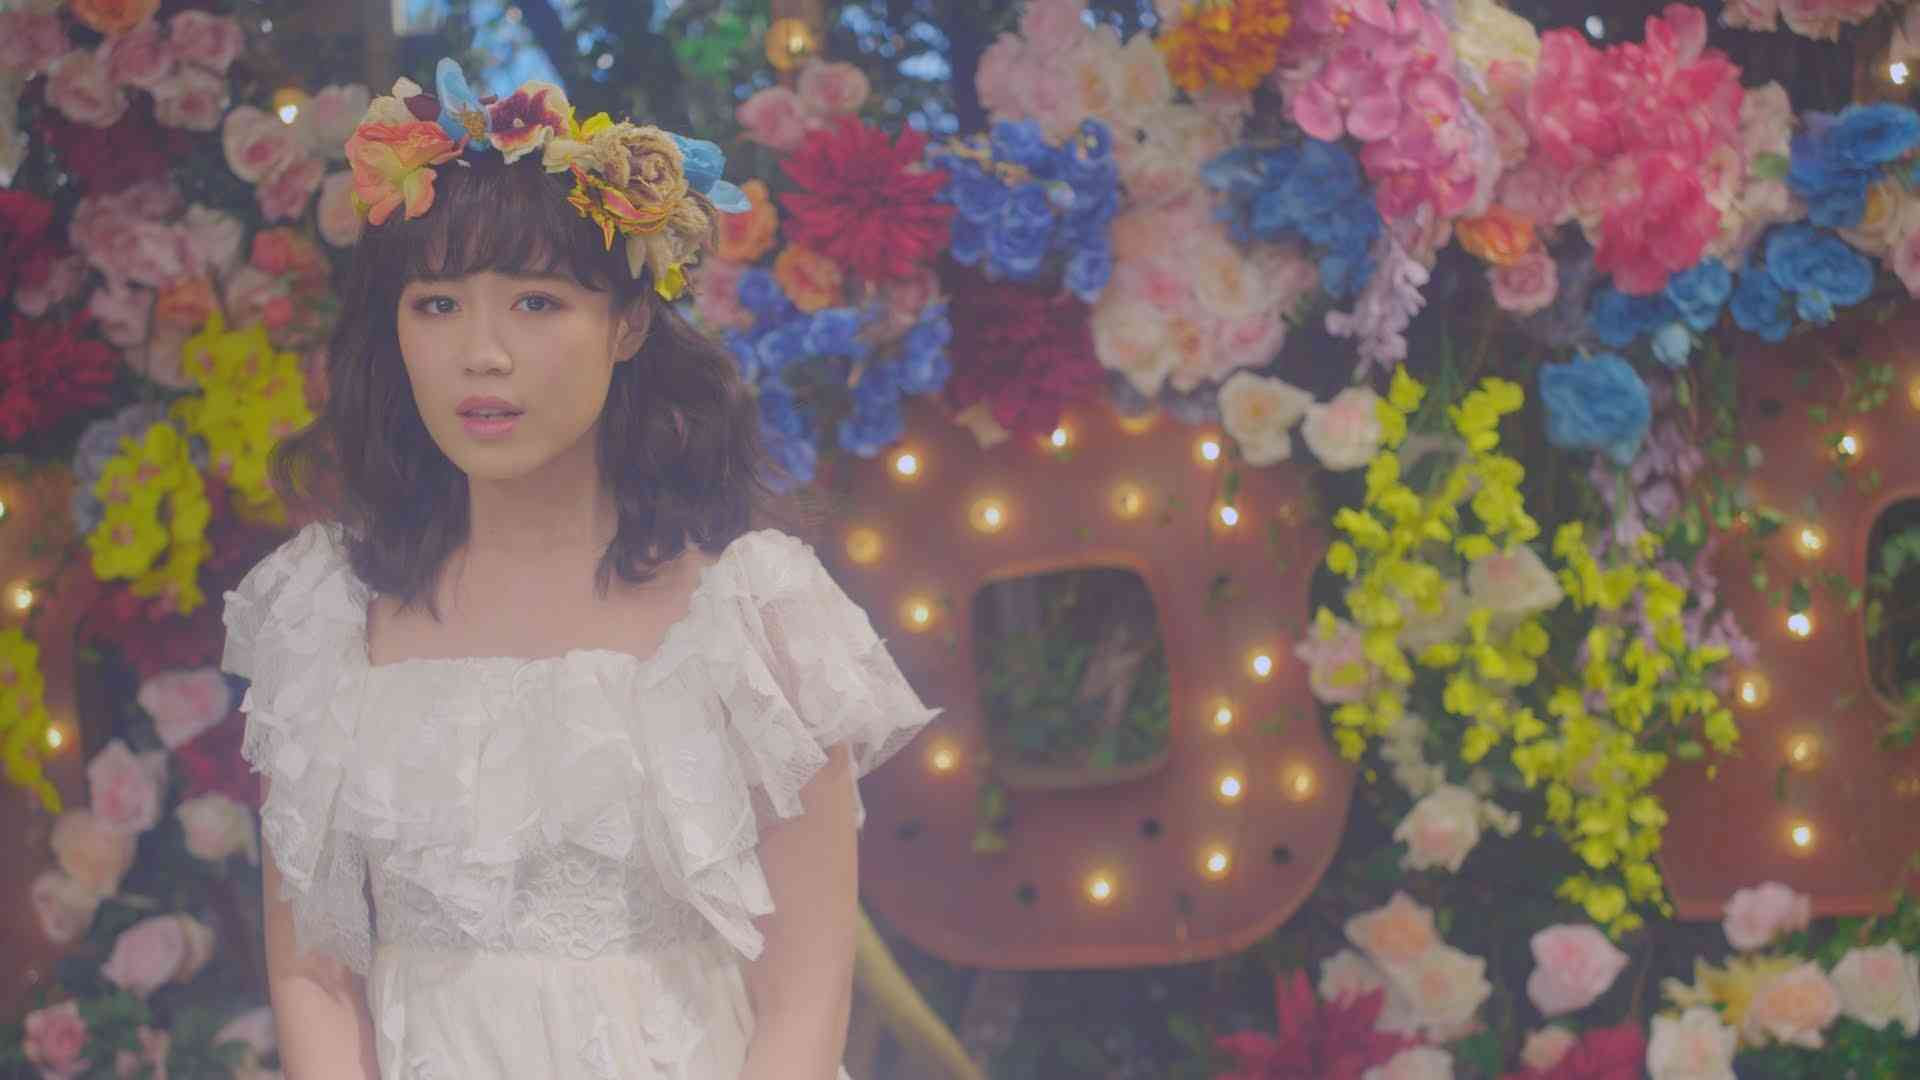 Flower 『さよなら、アリス』【蜷川実花 監督MV】3/4発売 2ndアルバム「花時計」 - YouTube